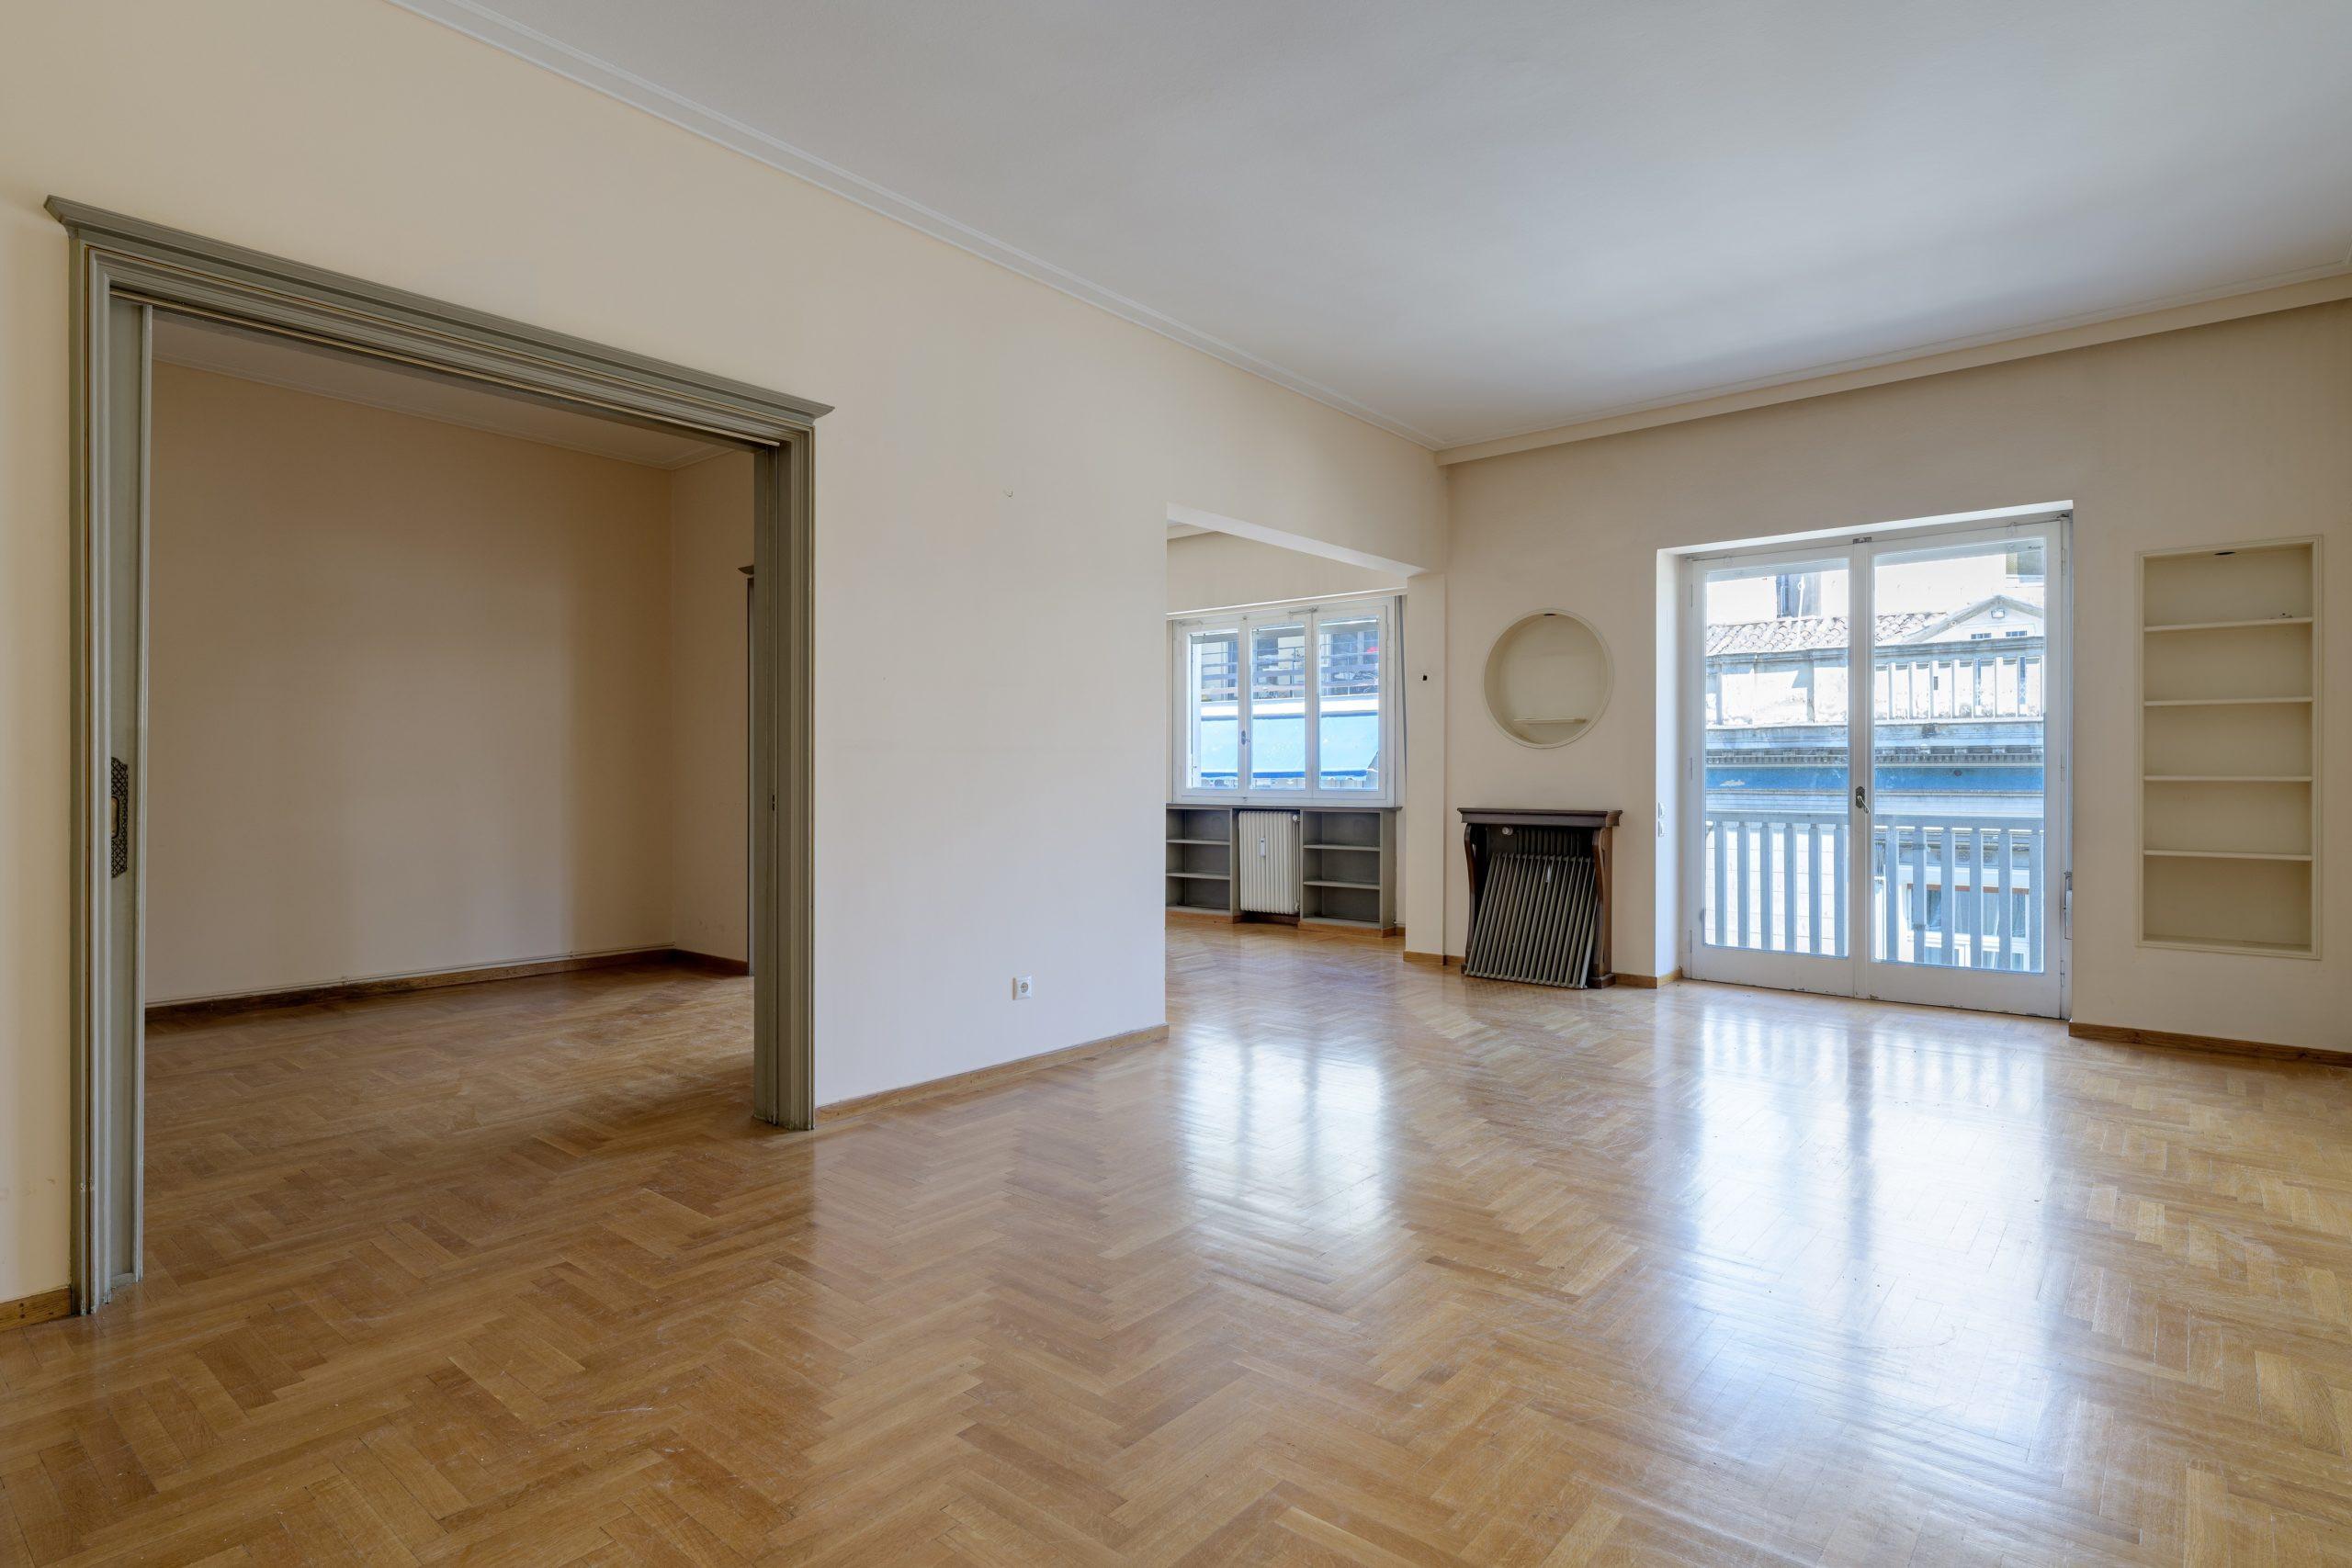 Appartement Kolonaki  -  ref GR-8089-S (picture 1)